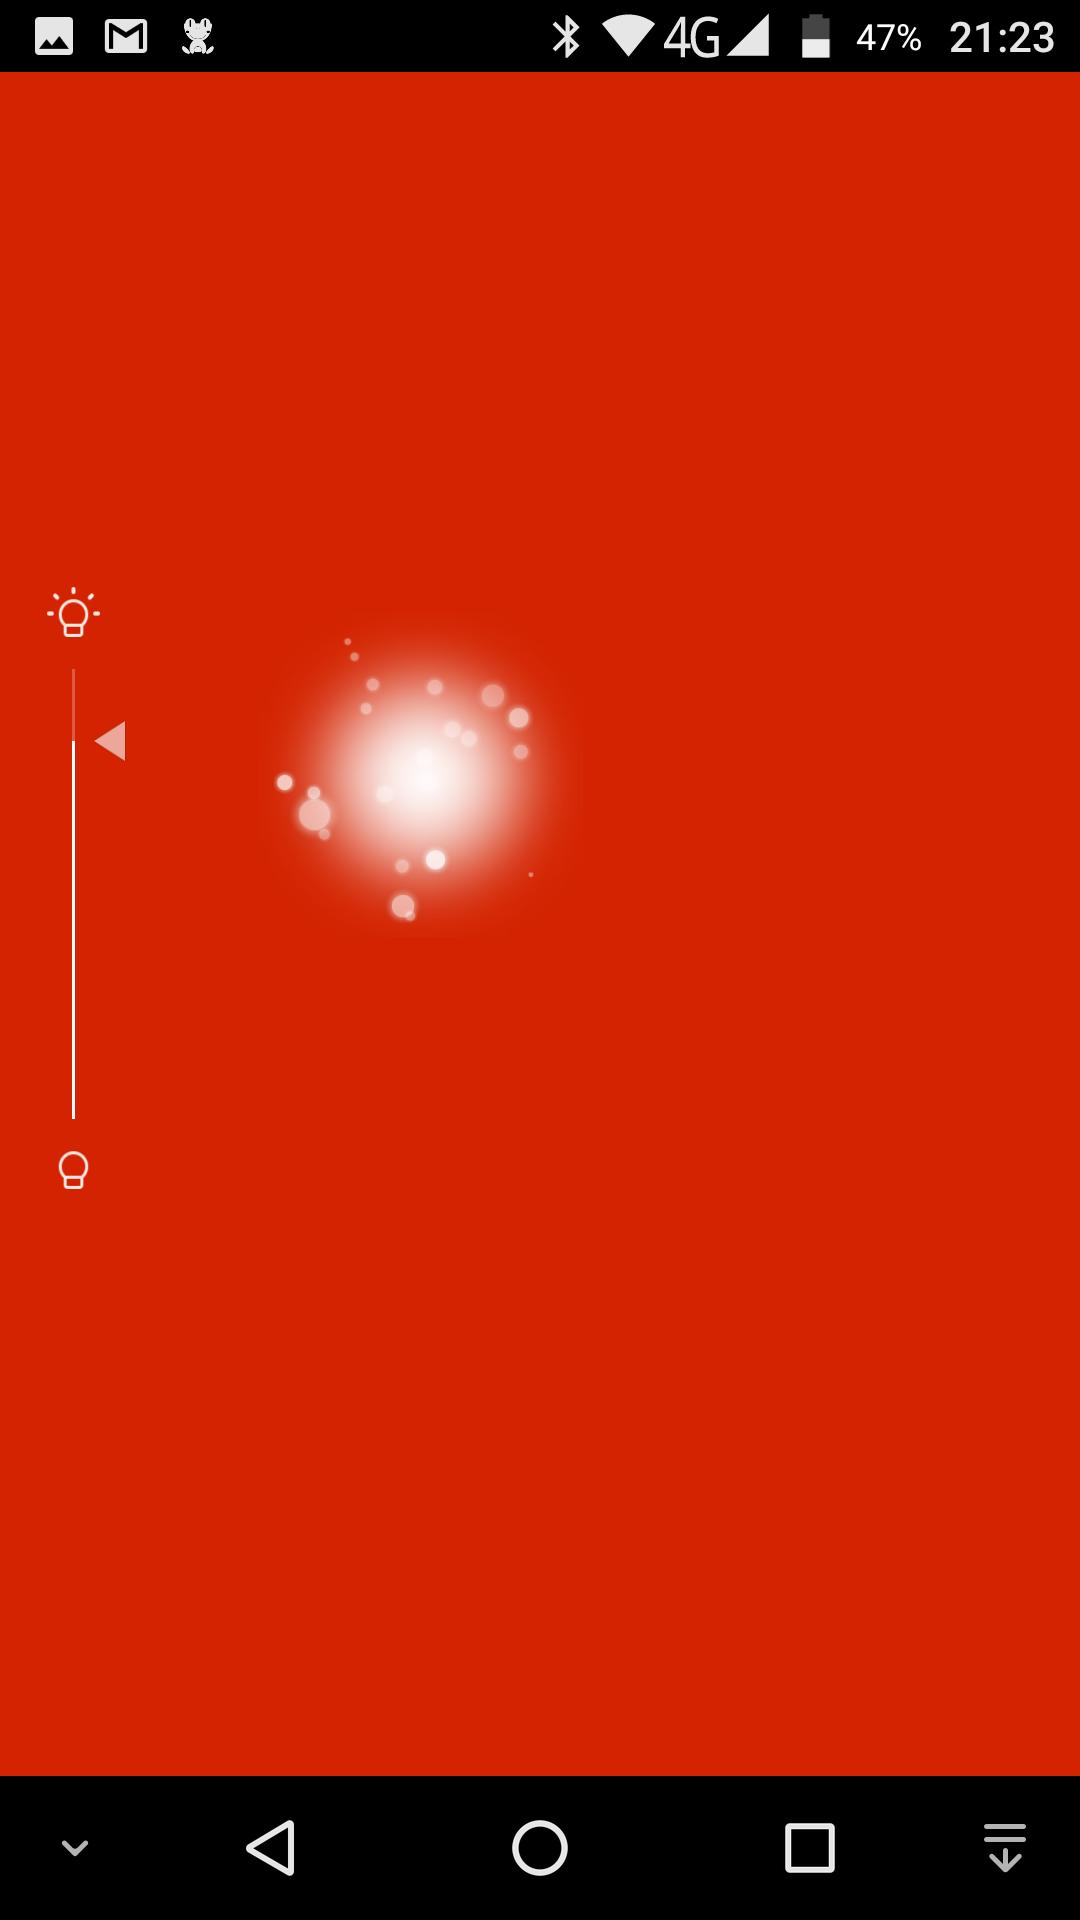 xiaomi_yeelight_menu_5.png